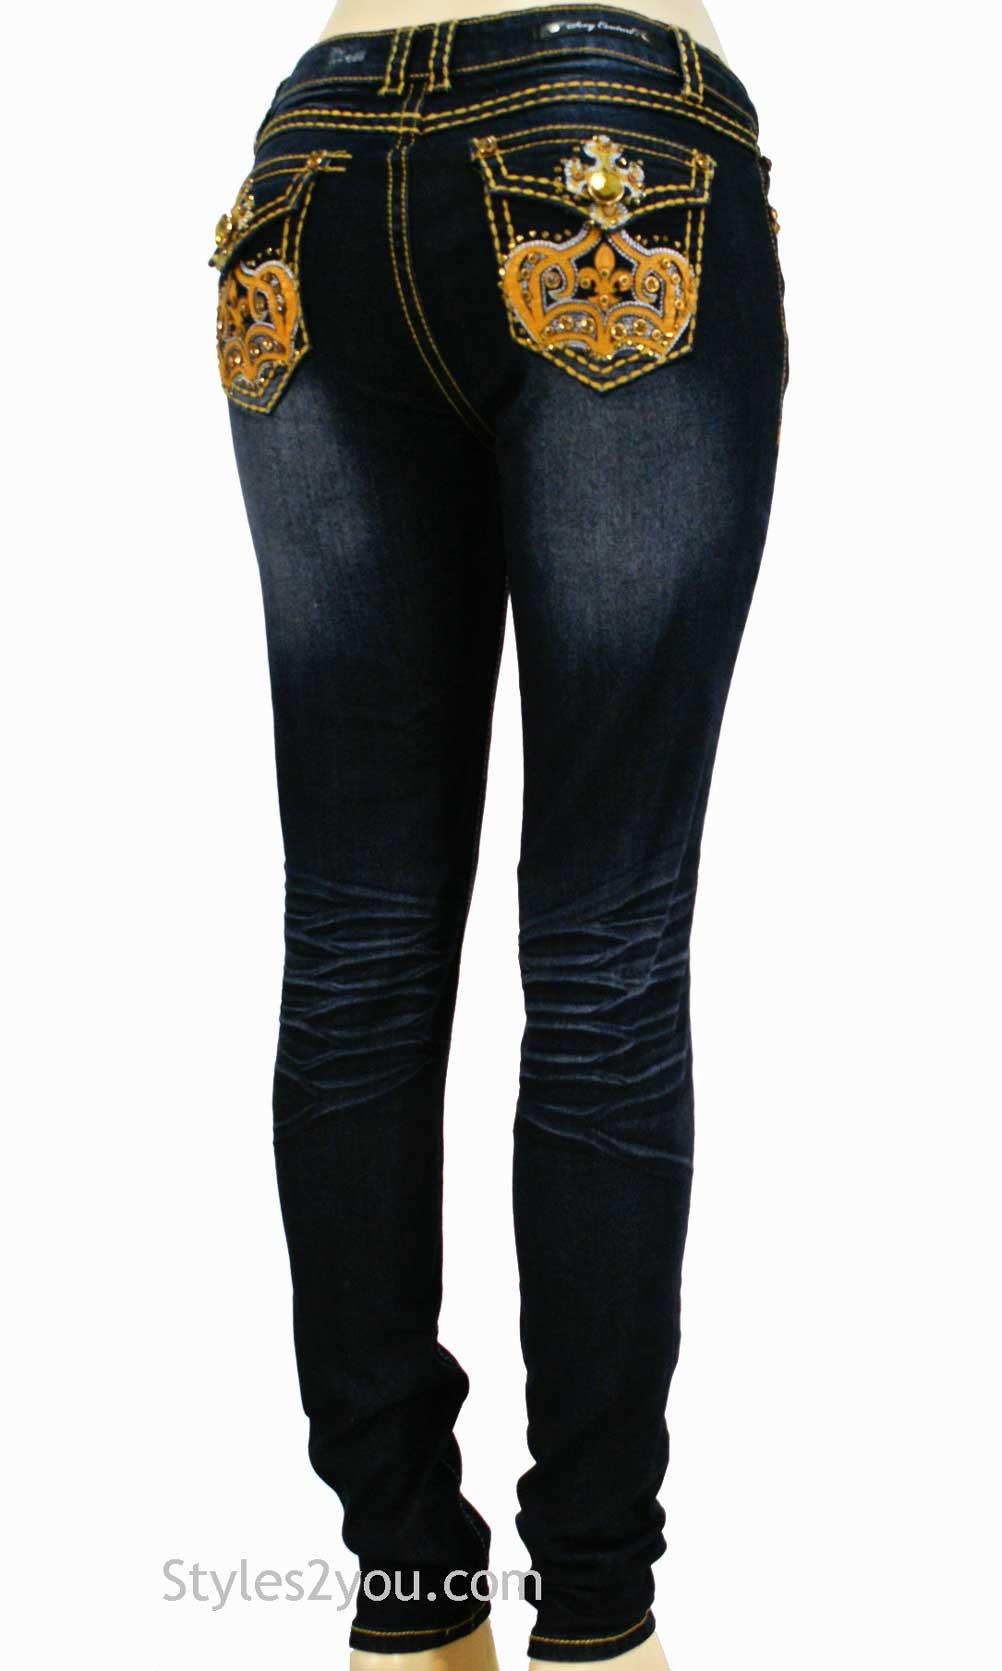 Royal Stretch Denim Jeans In Blue [145854 Sexy Cexi Couture Denim ...